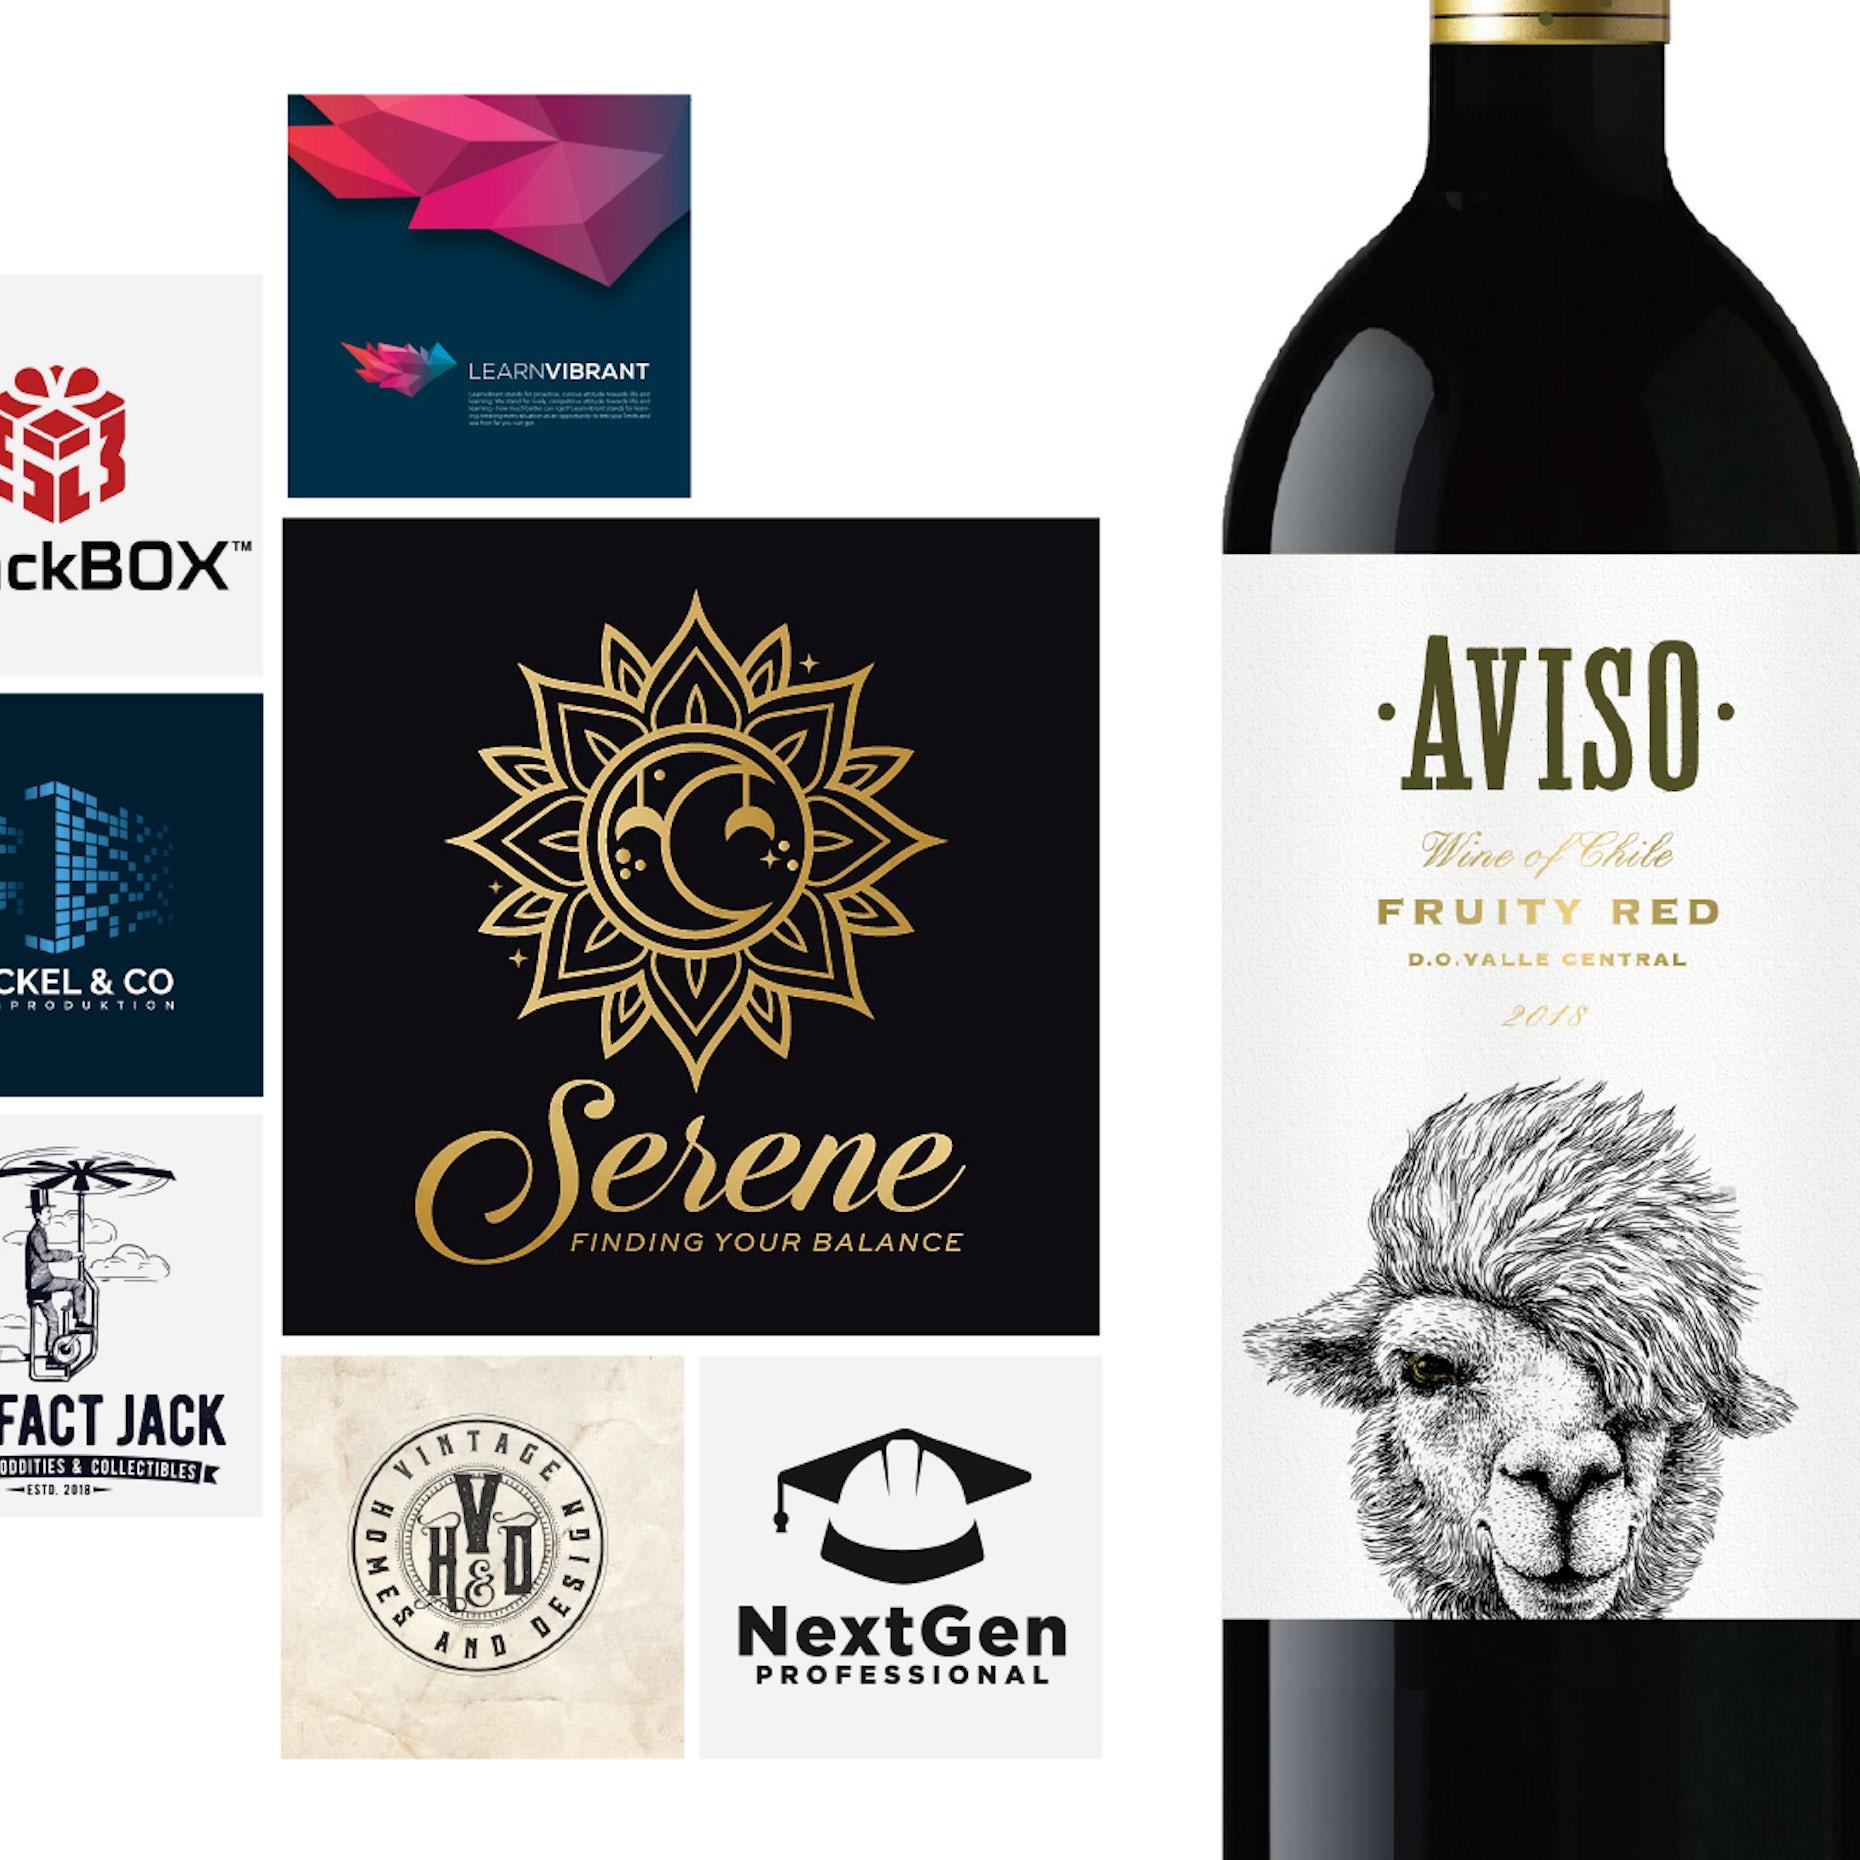 79413c09651 10 creative branding trends for 2019 - 99designs